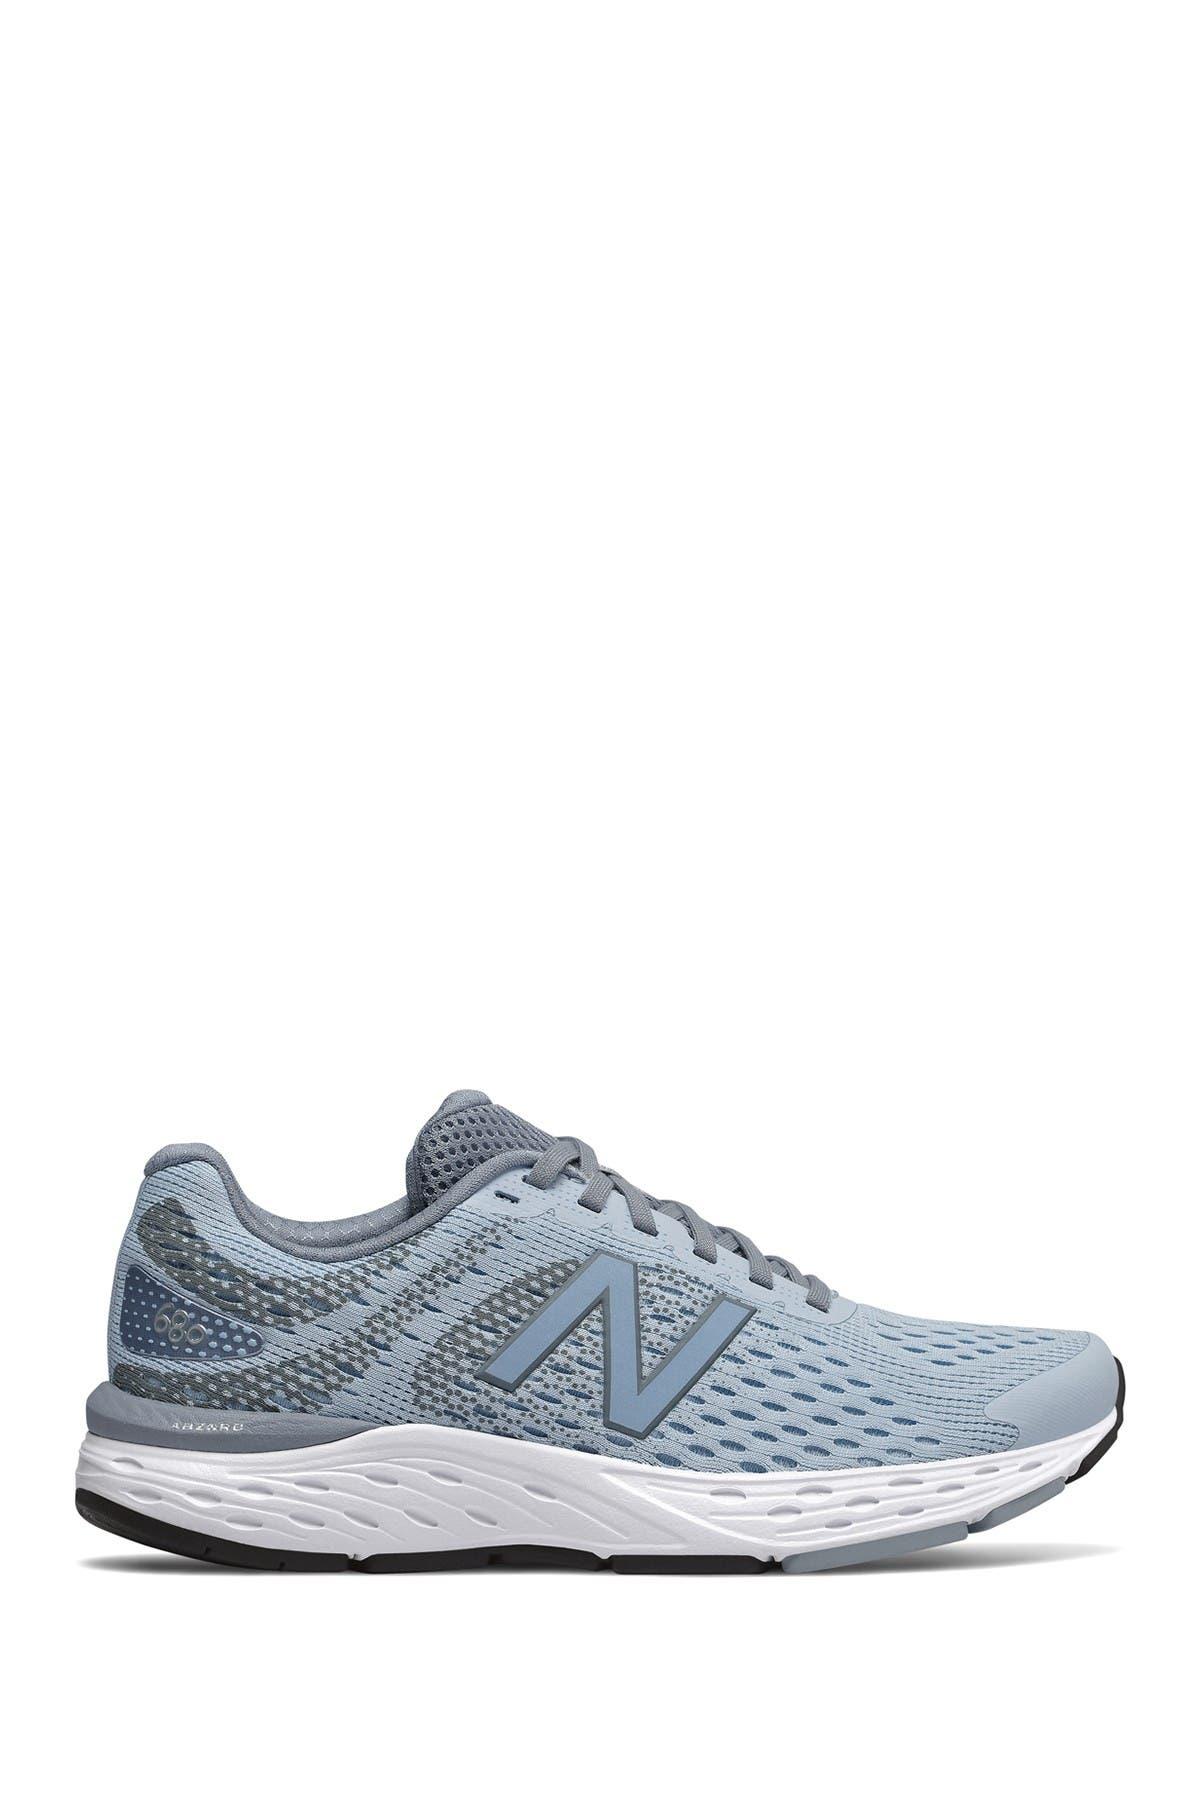 New Balance   680v6 Running Shoe